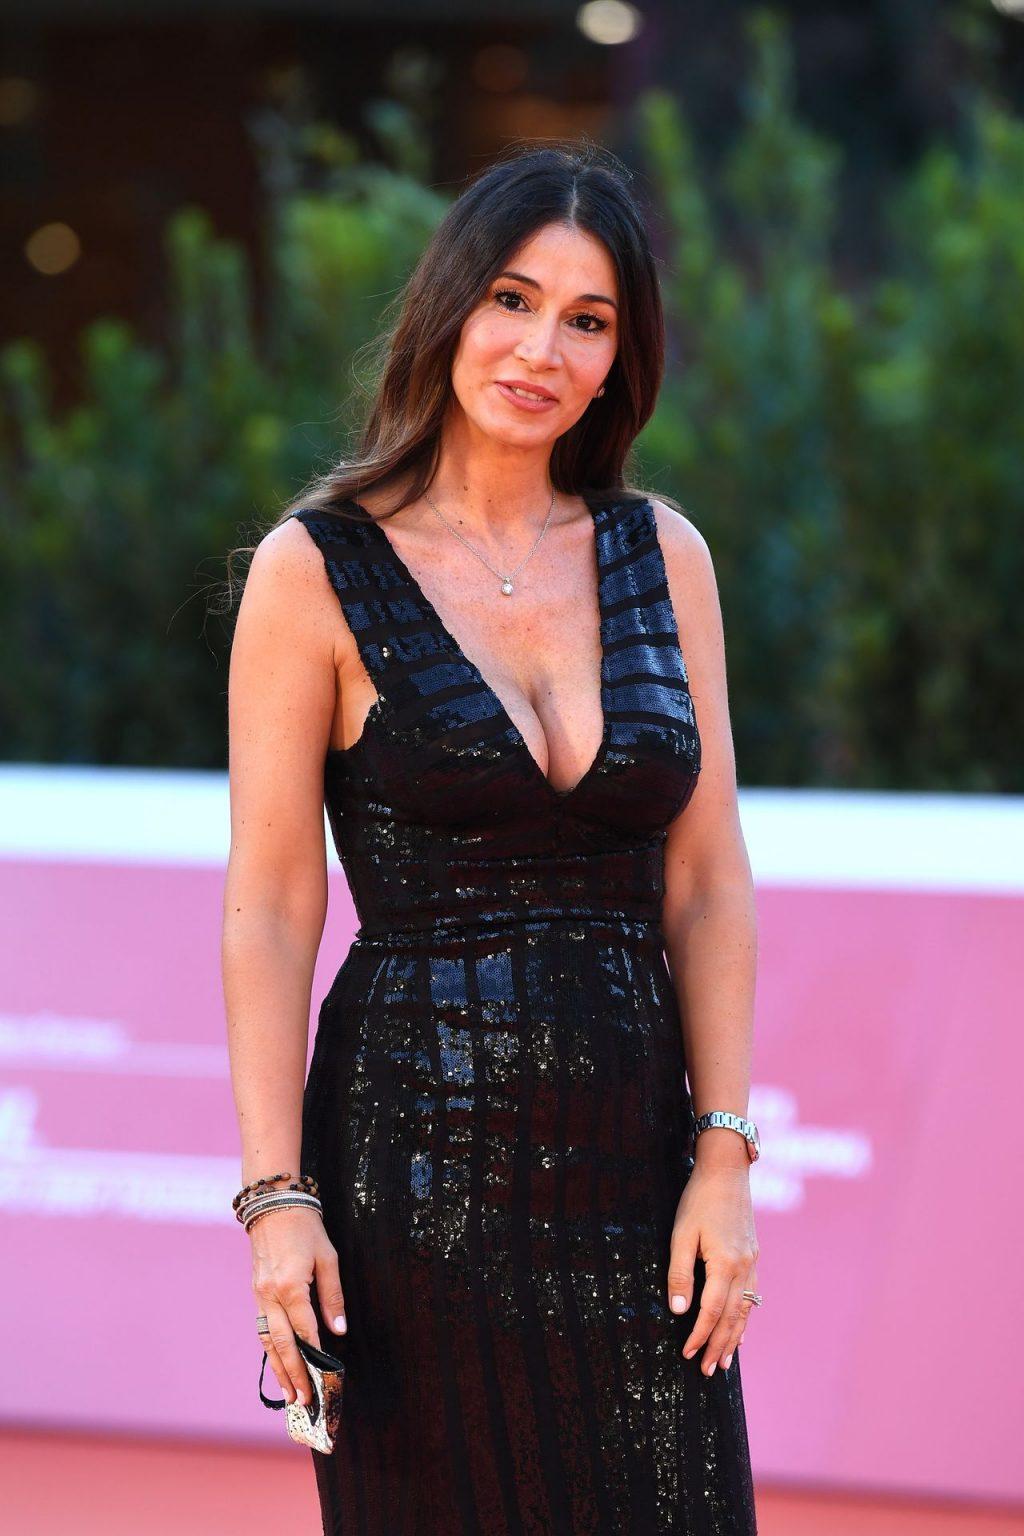 Elisabetta Bardelli Ricci Shows Off Her Boobs in Rome (27 Photos)